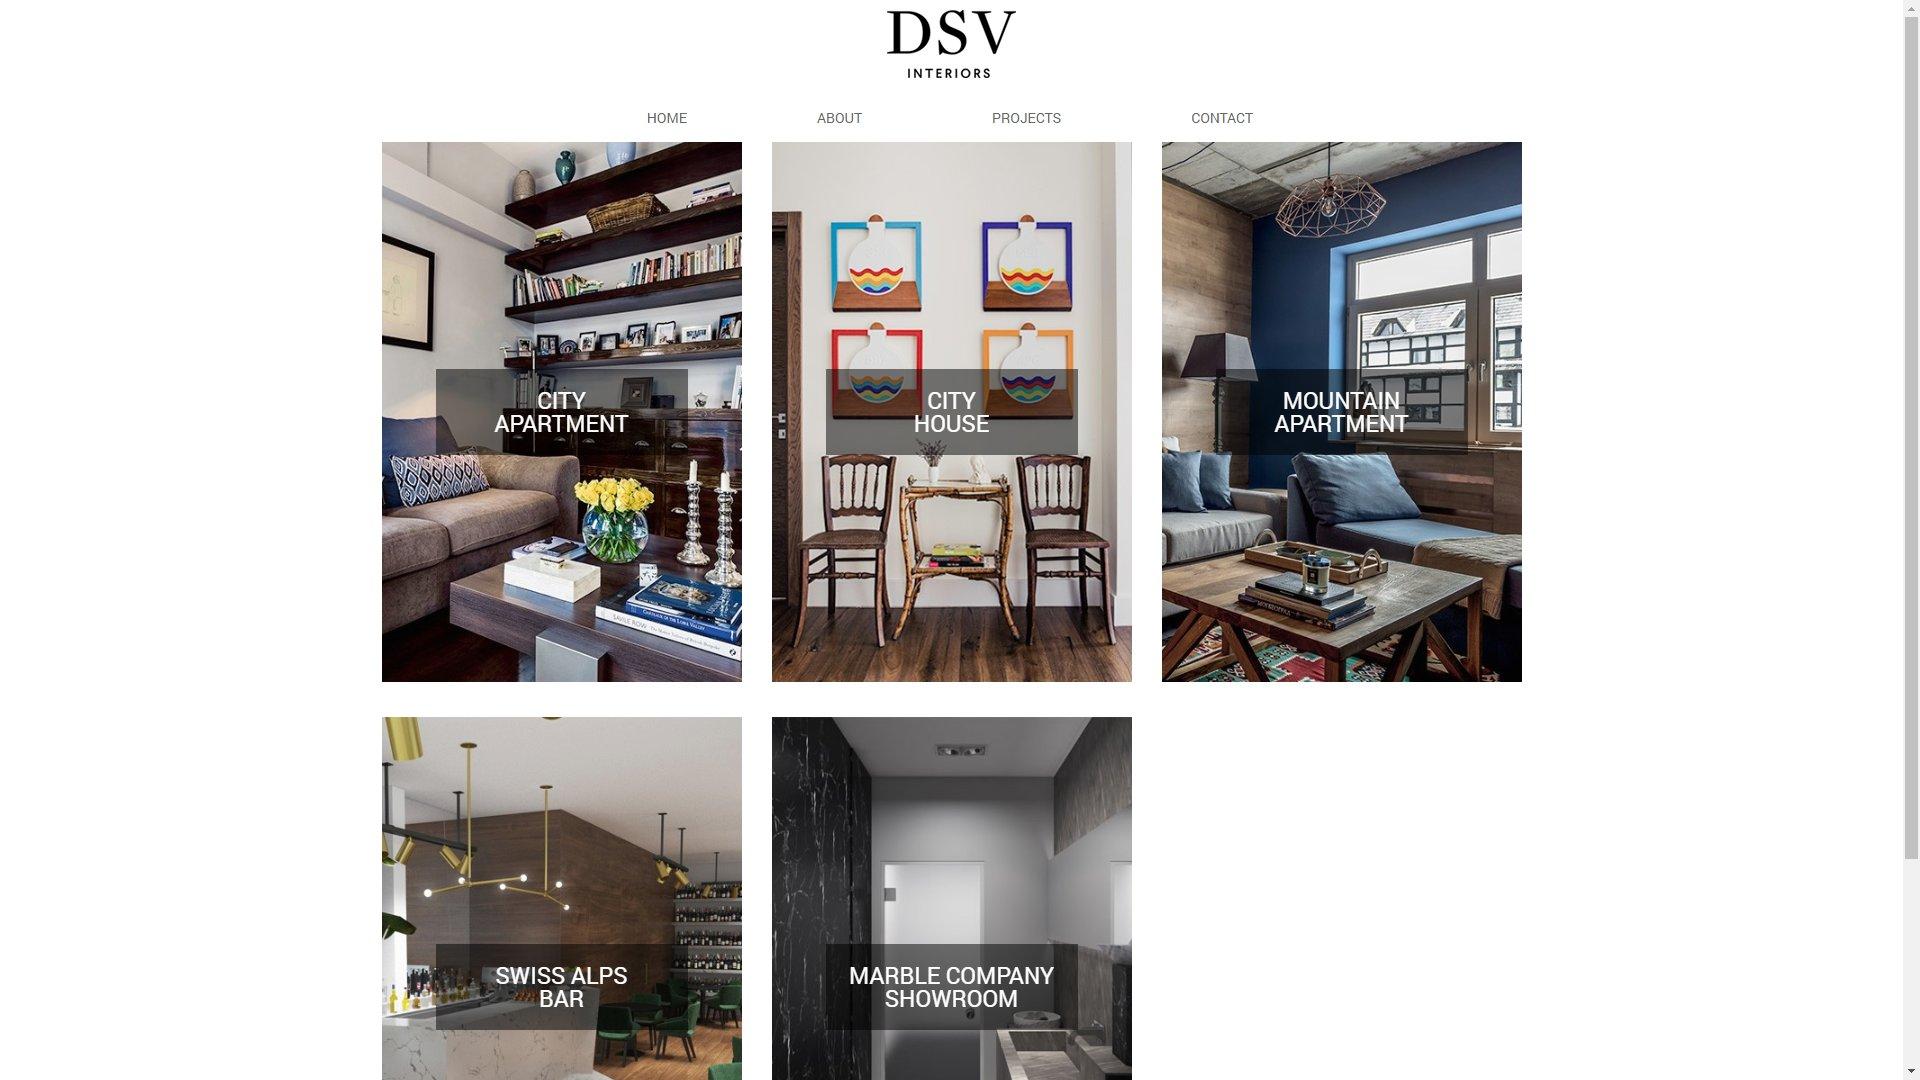 DSV Interiors - ss2